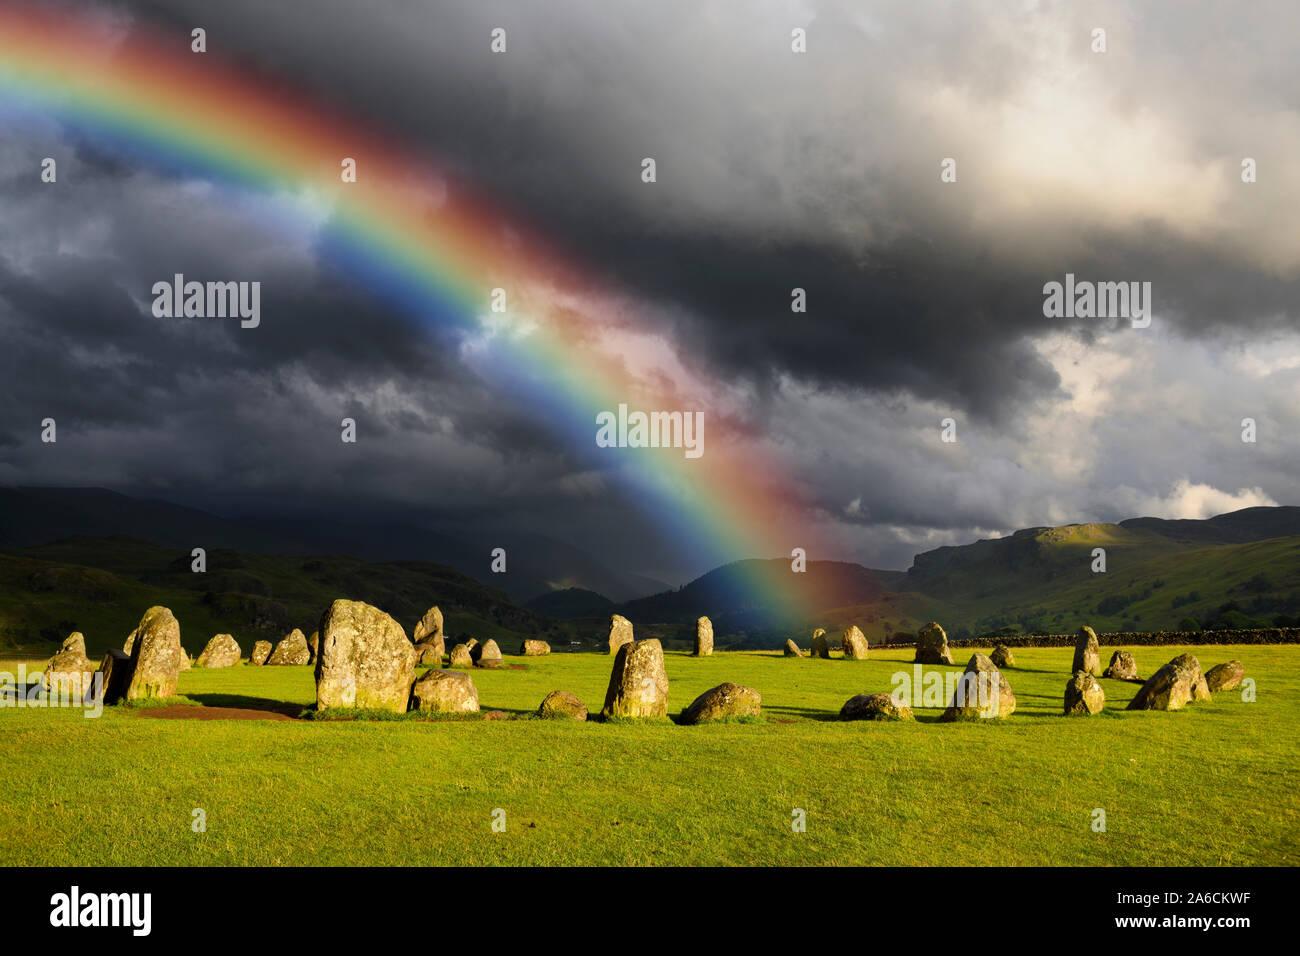 rainbow-over-castlerigg-stone-circle-on-